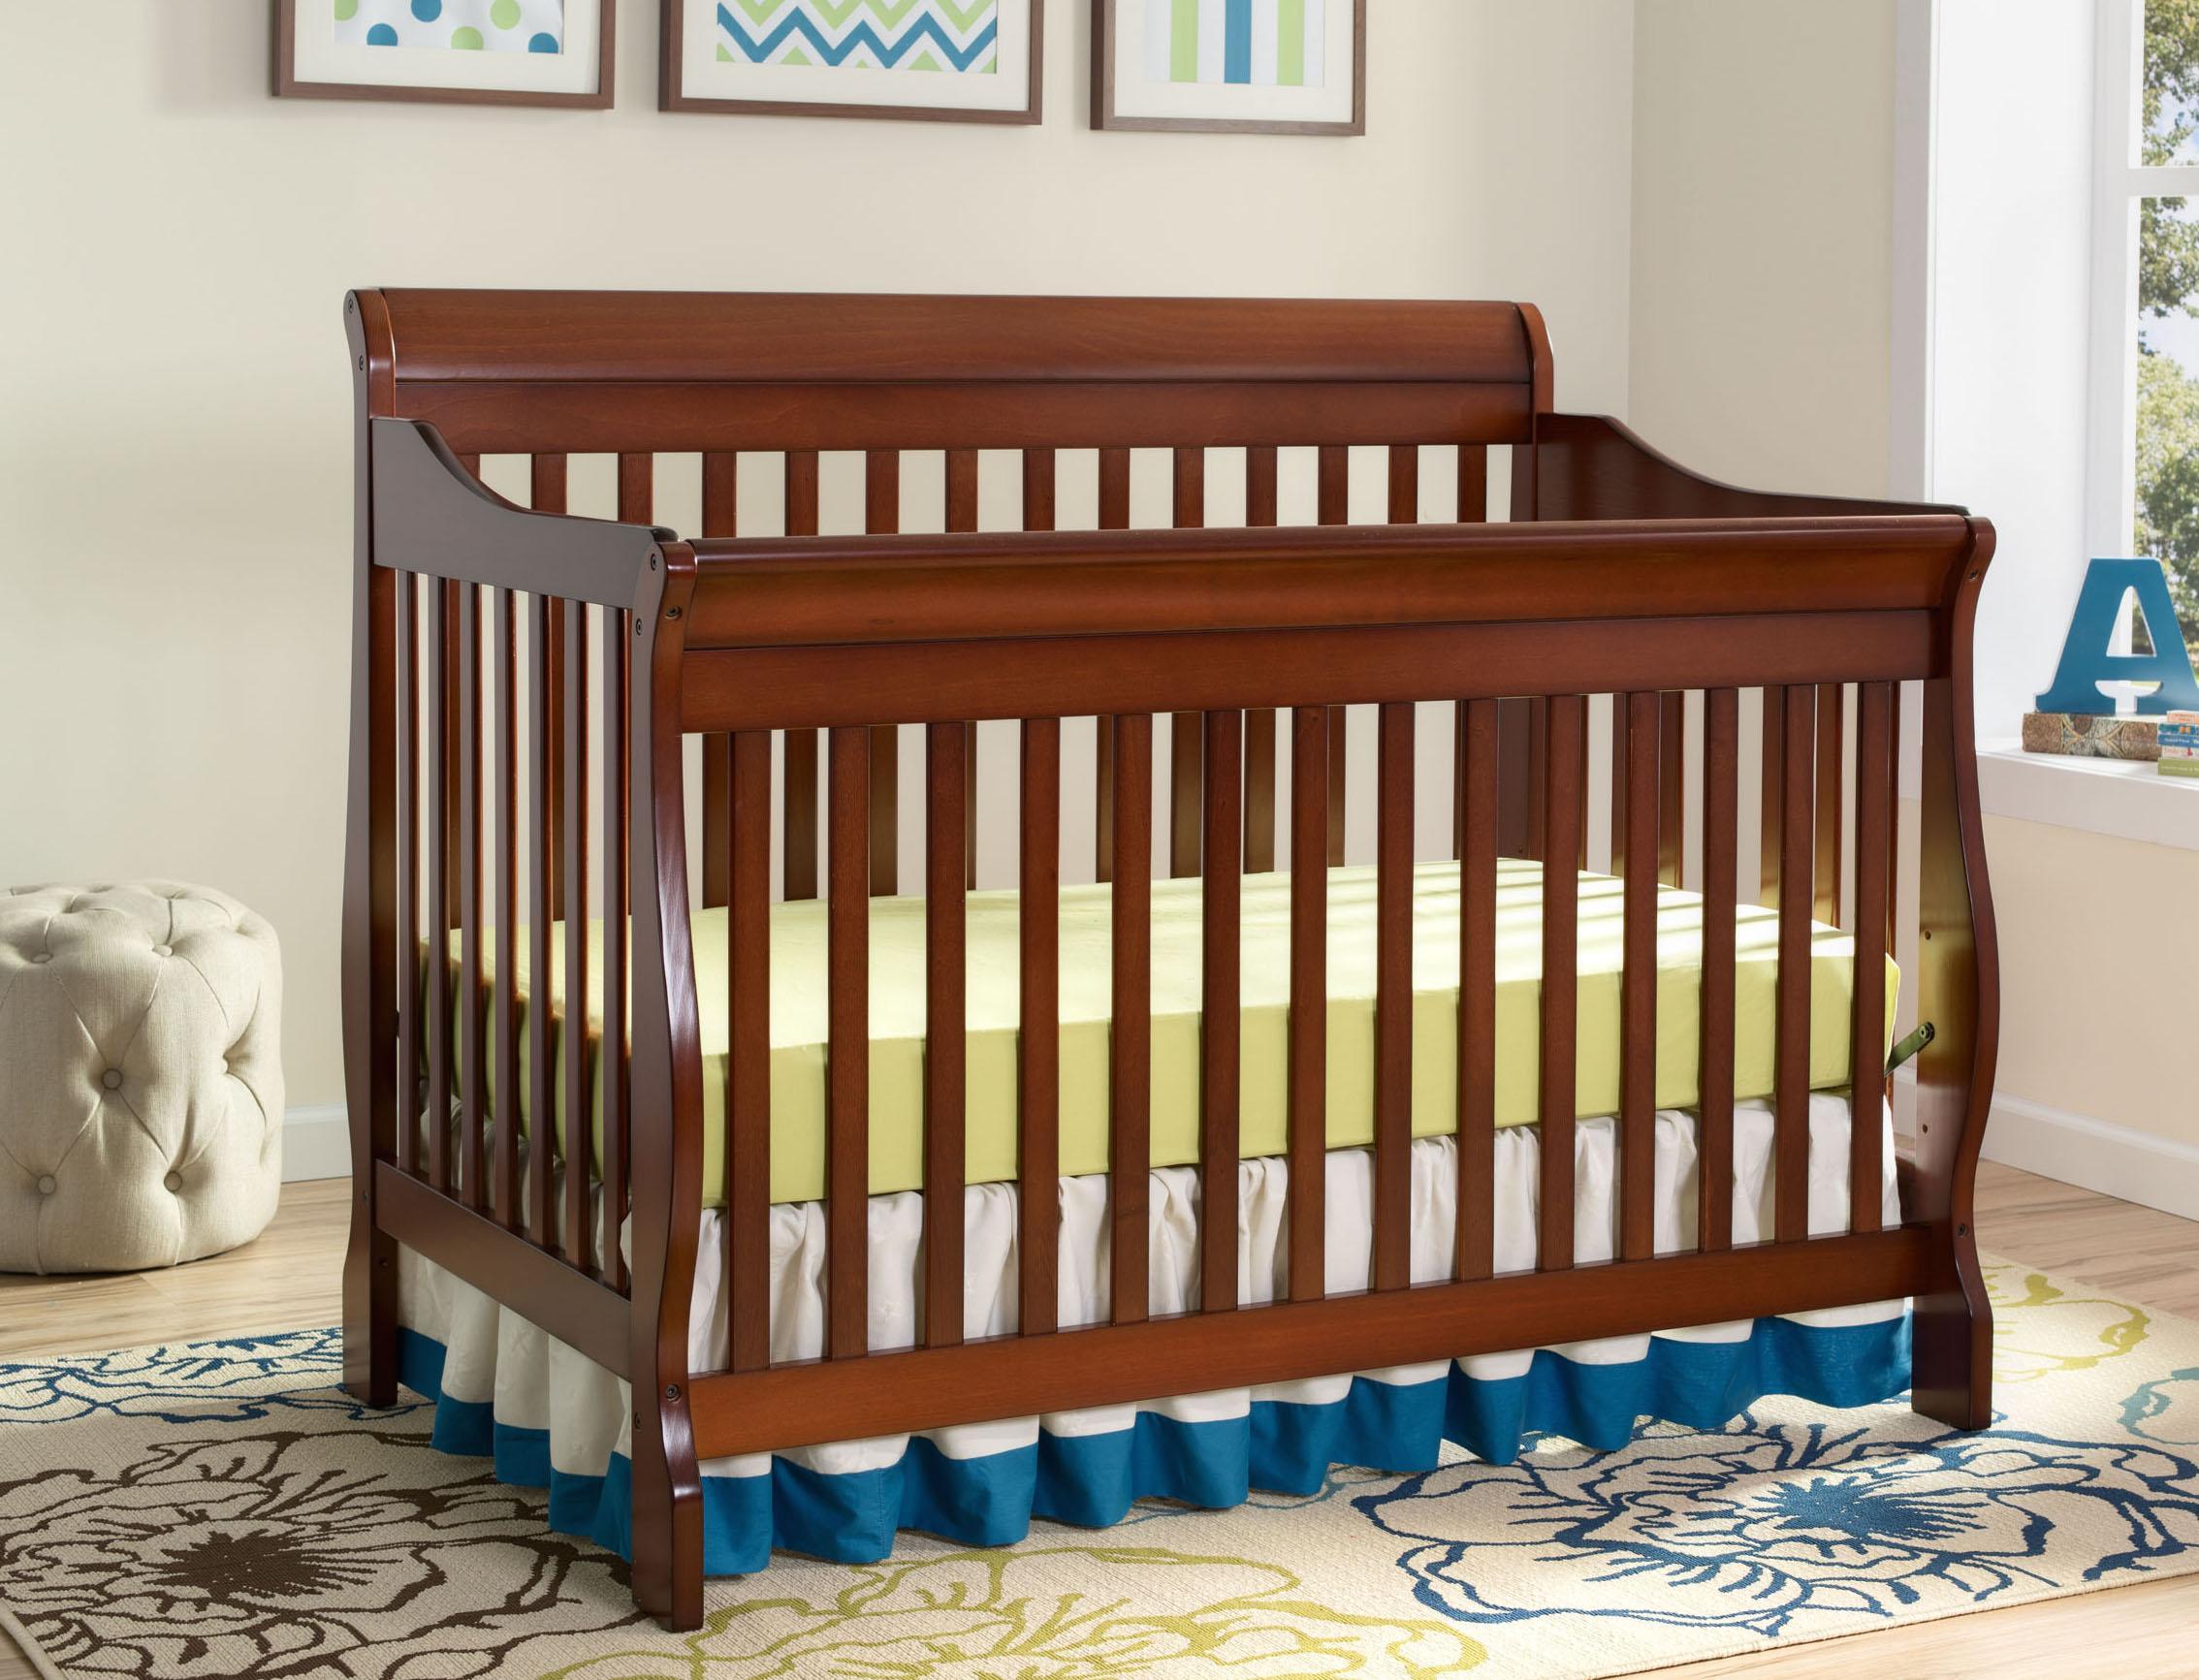 Amazon.com : Delta Children Canton 4-in-1 Convertible Baby ...